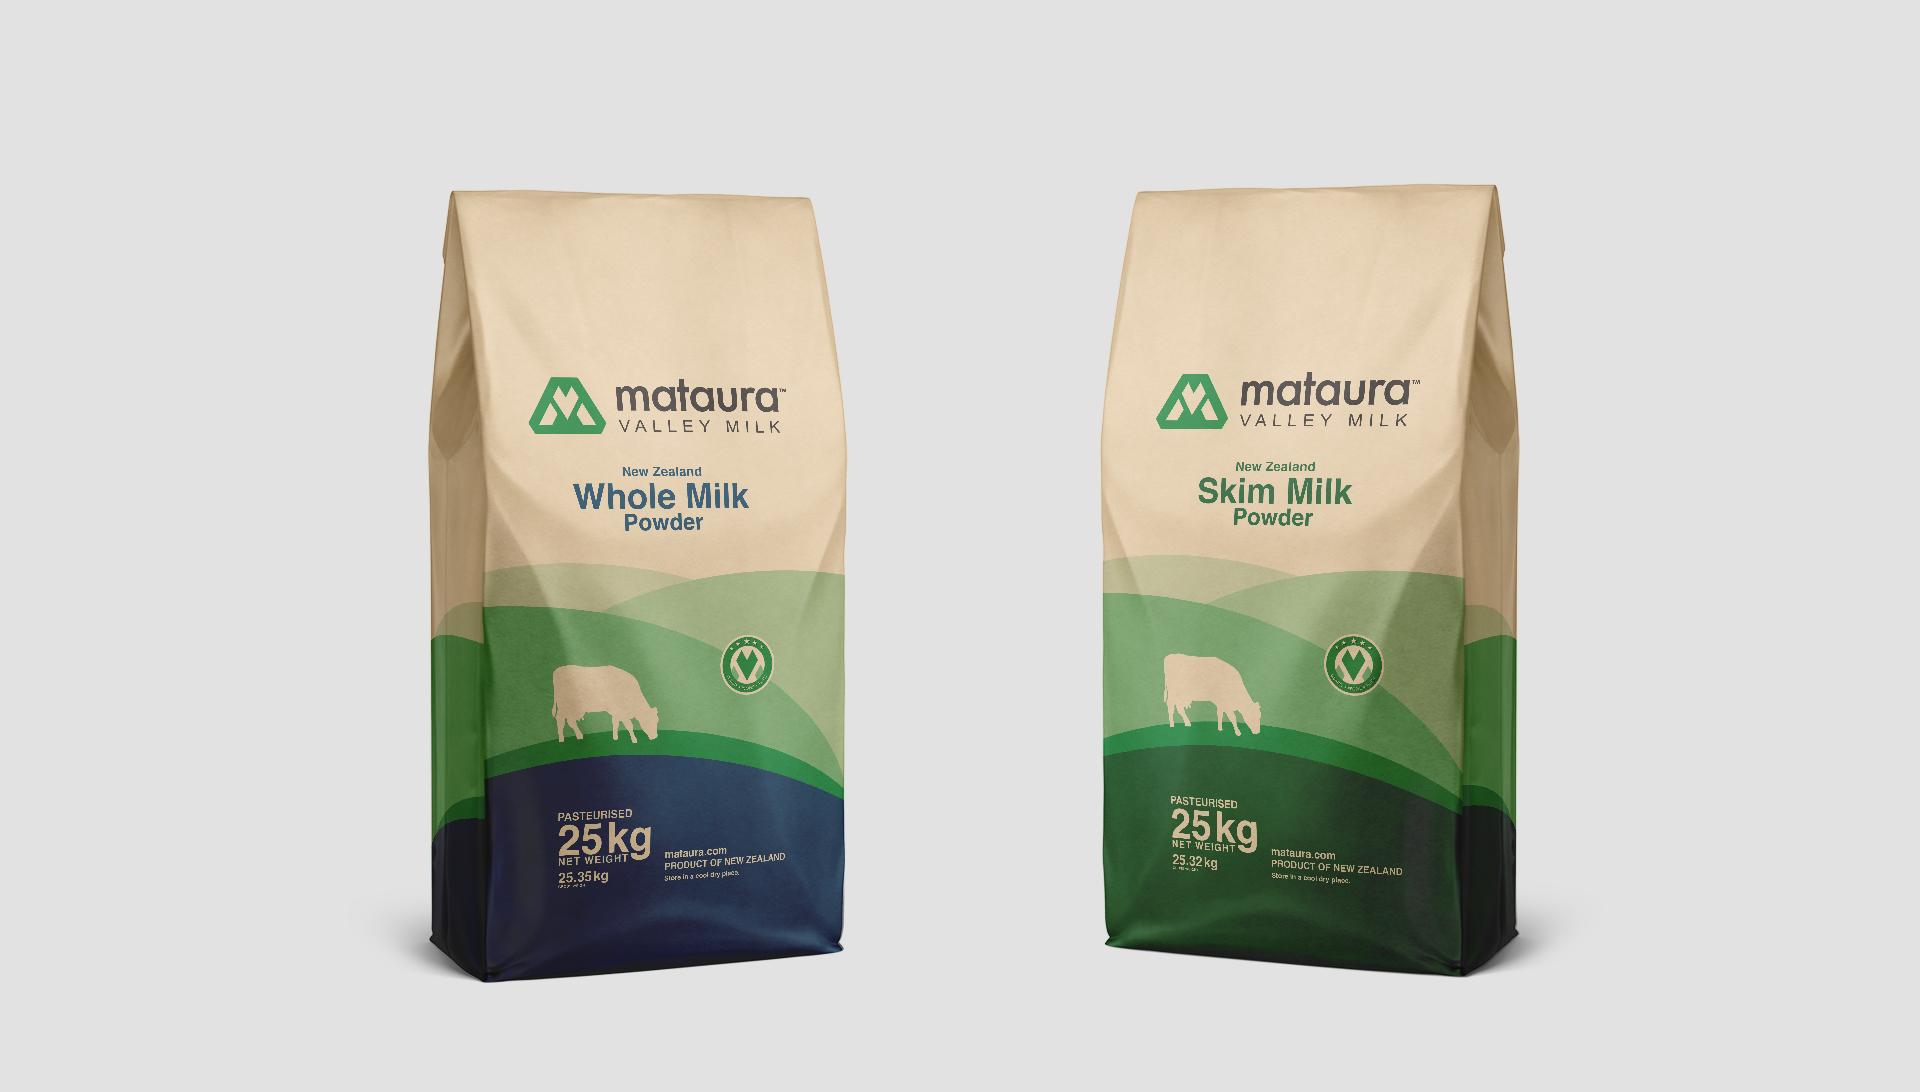 Mataura-Valley-Milk-Packaging-01